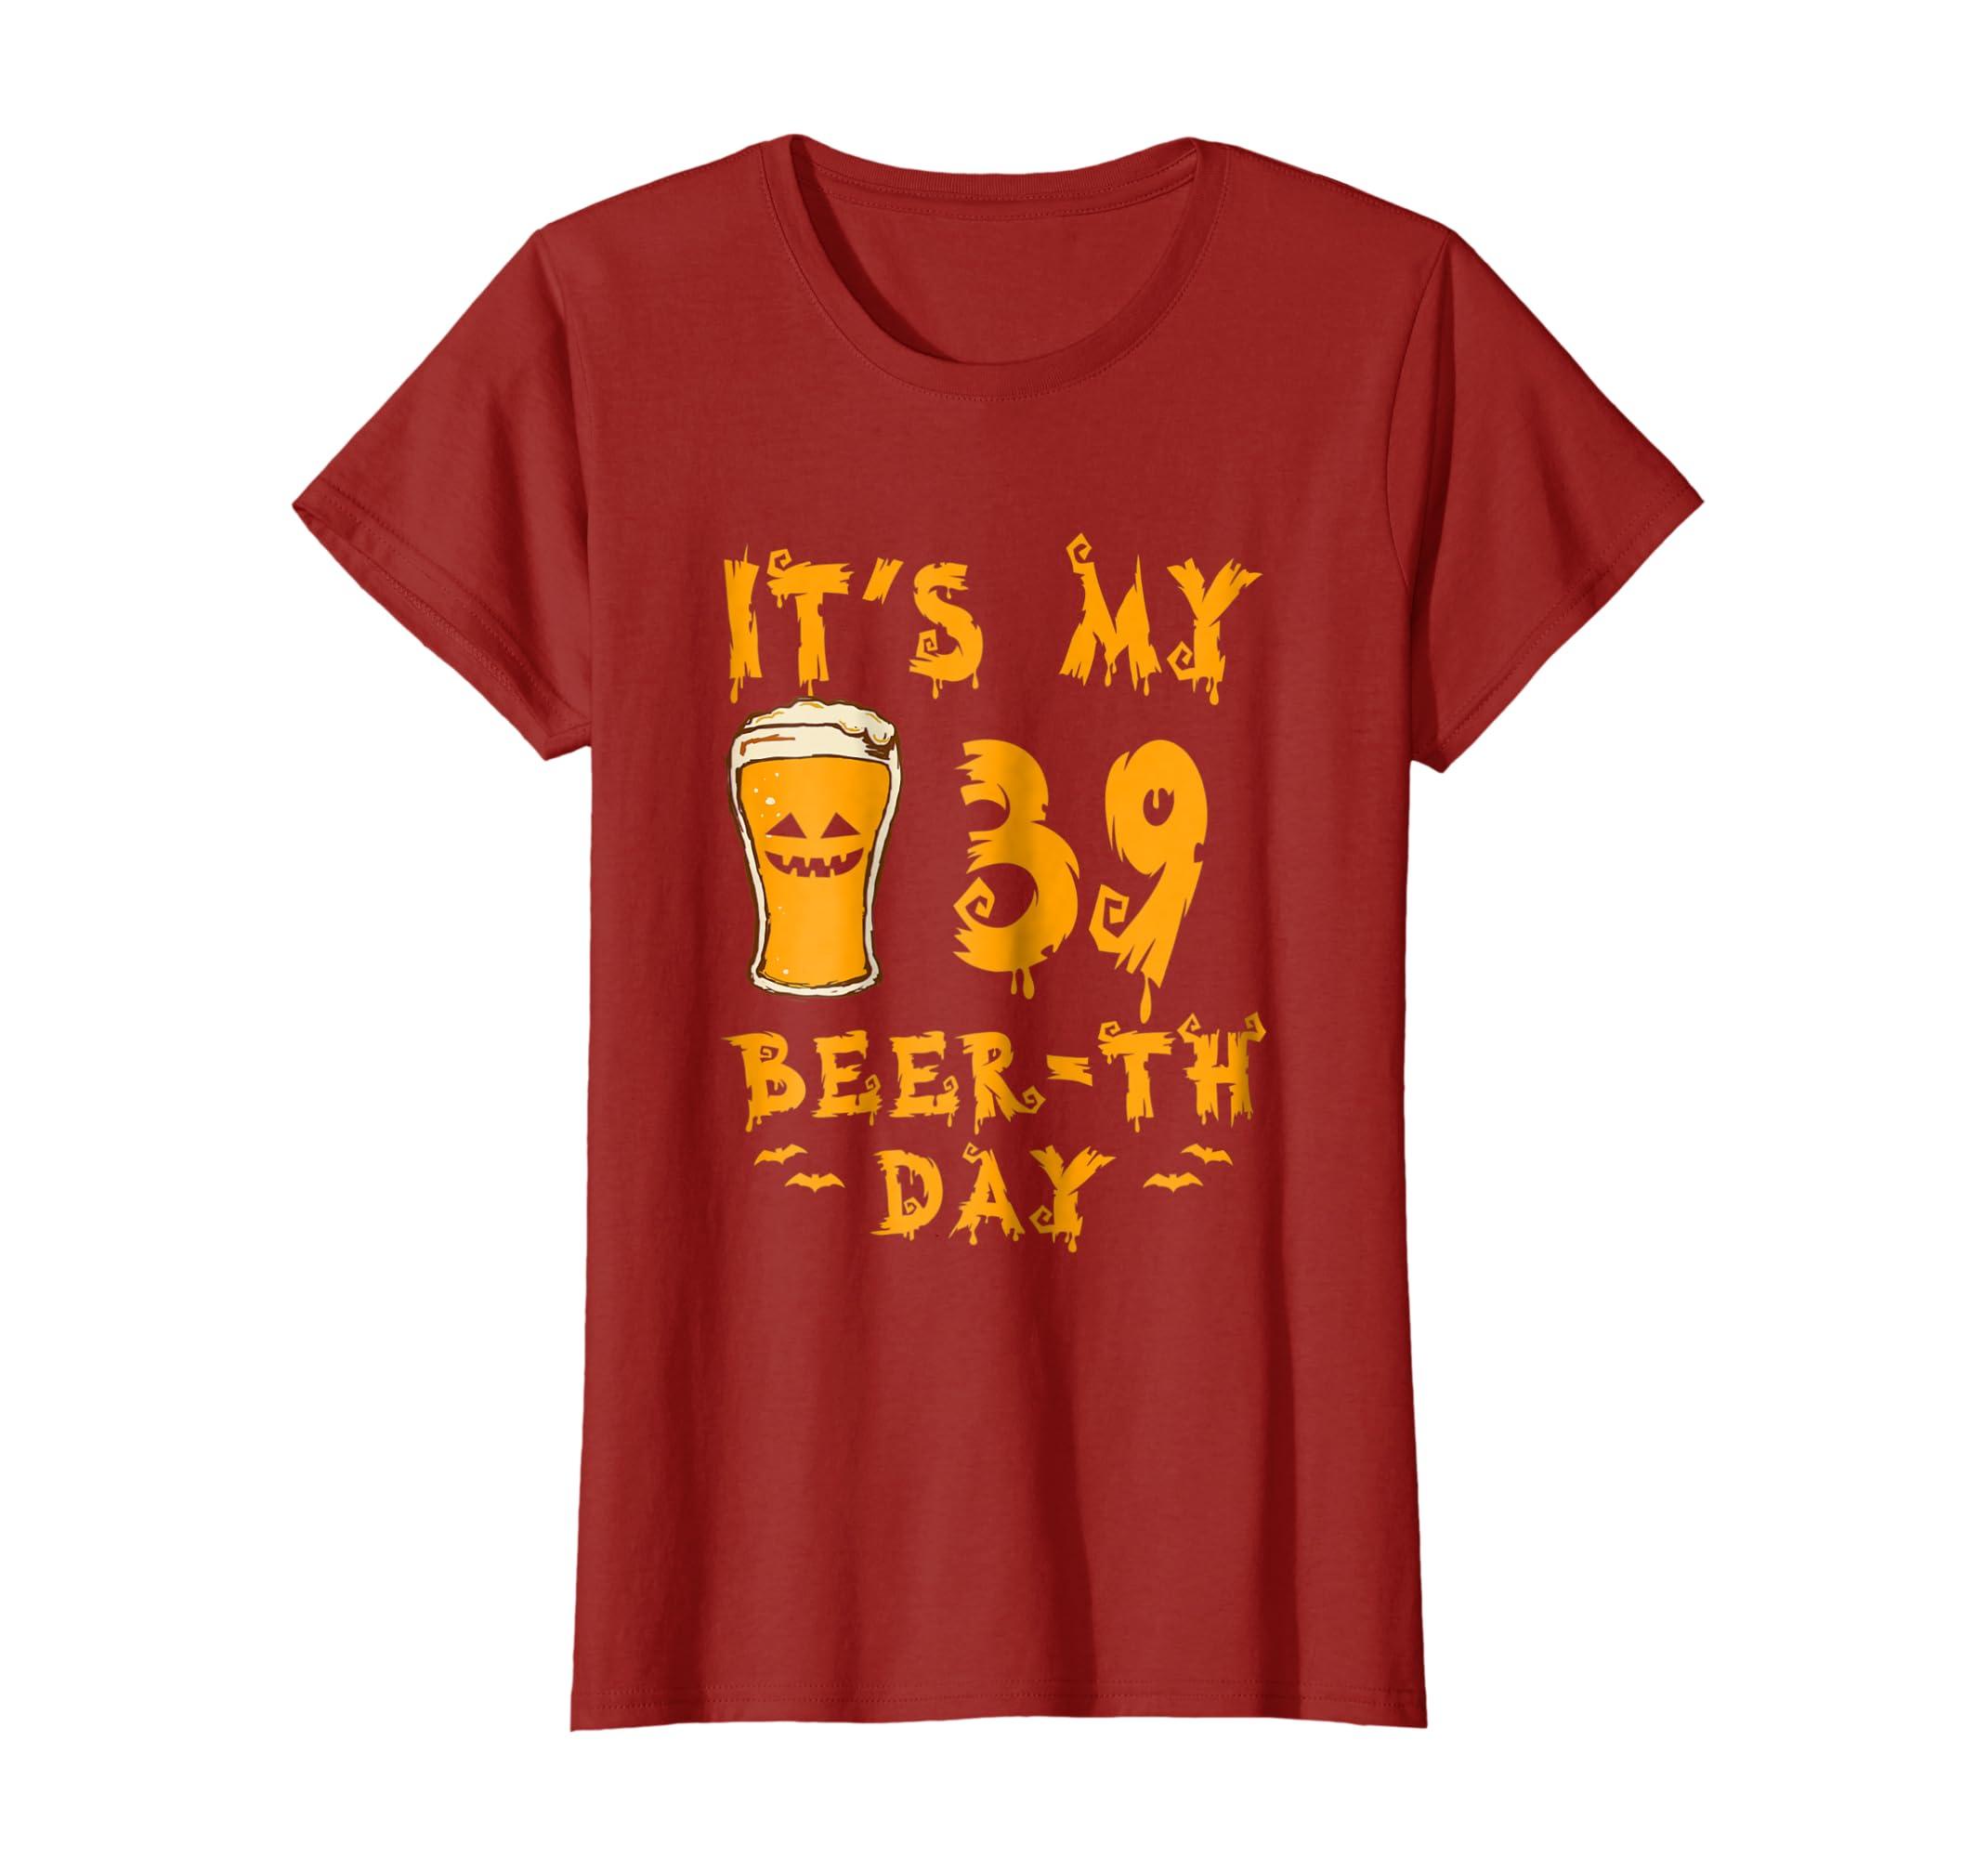 Halloween T Shirt Ideas.Amazon Com It S My 39th Beerth Day Halloween T Shirt